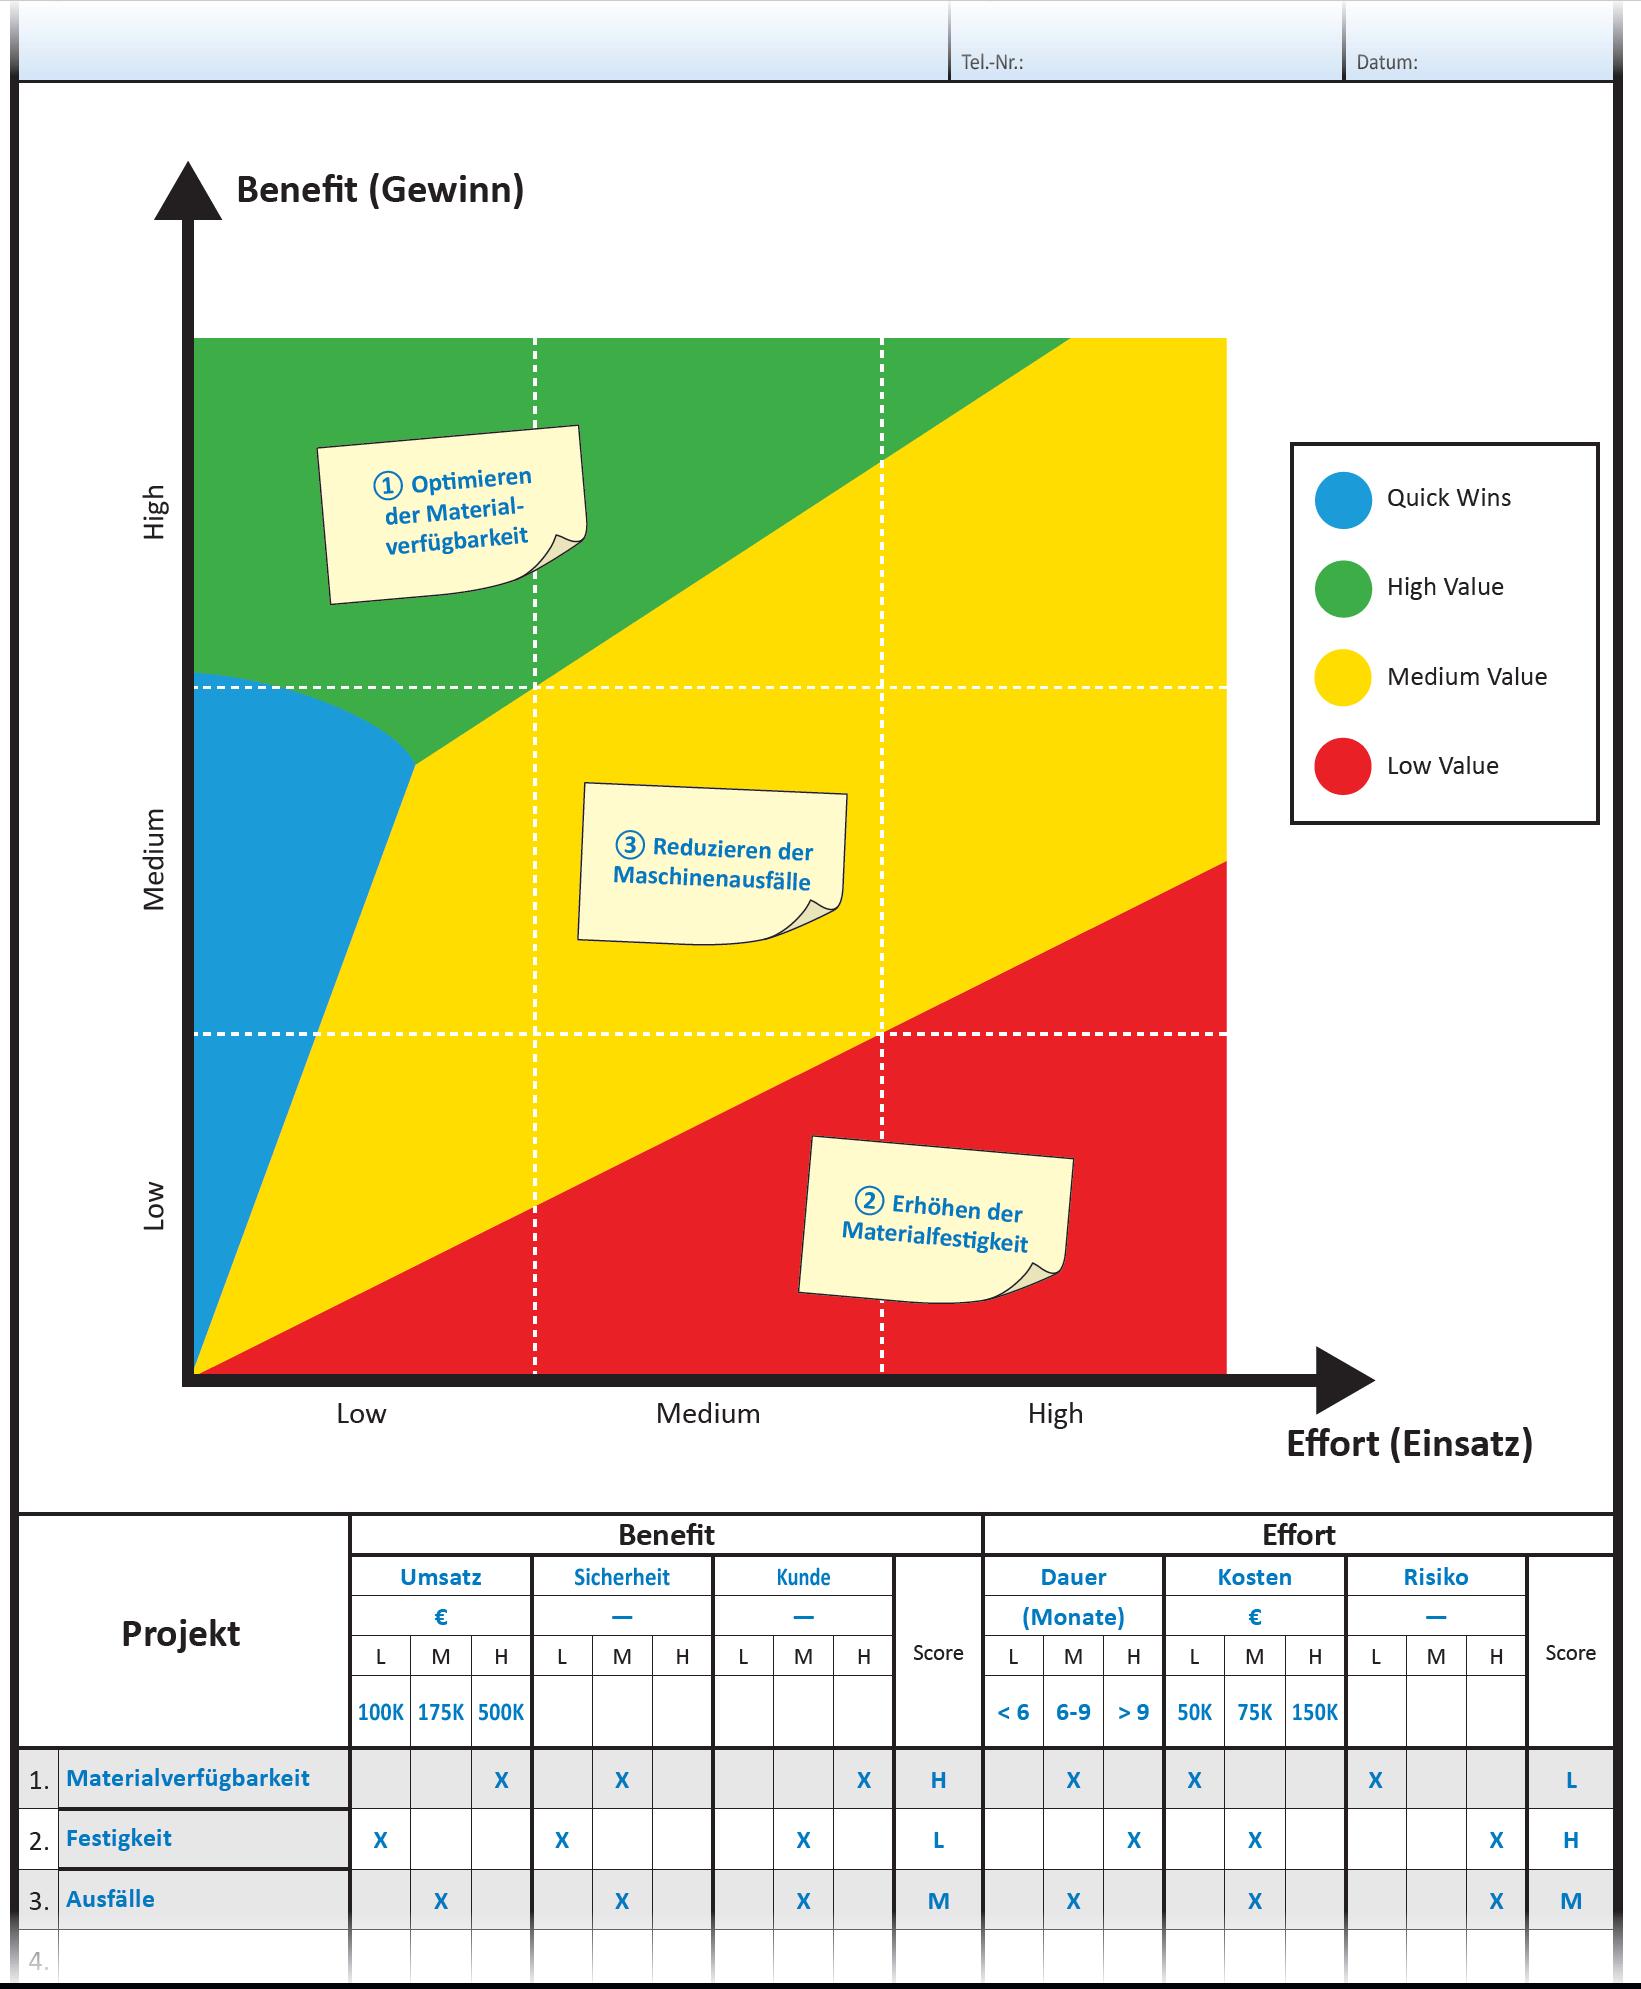 Benefit and Effort Plot